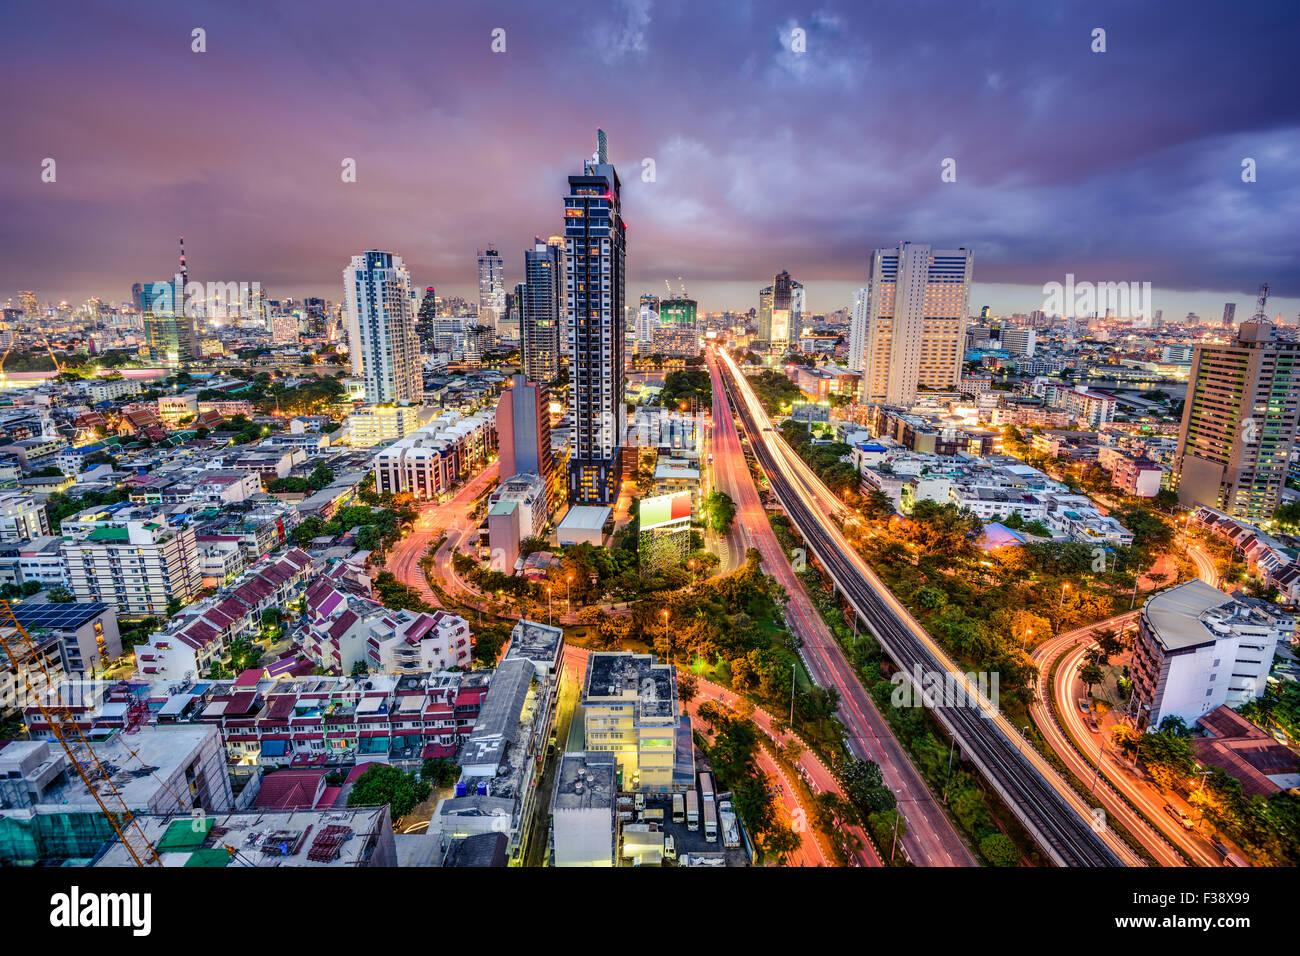 Bangkok, Thaïlande crépuscule paysage urbain. Photo Stock